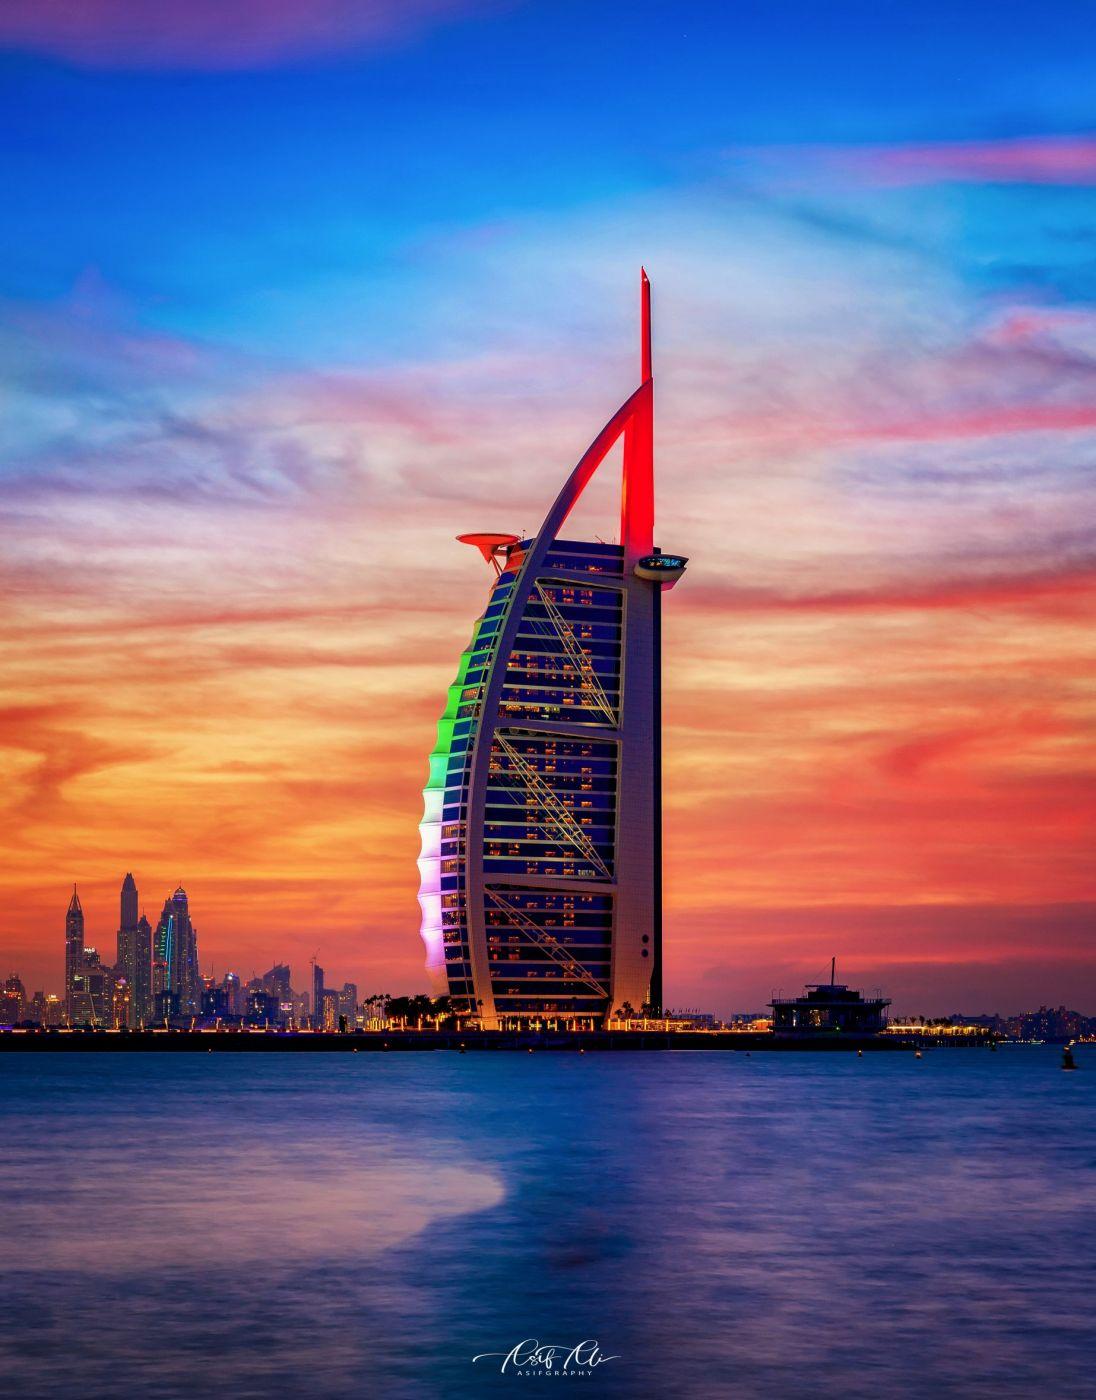 Burj Al Arab Jumeirah Dubai, United Arab Emirates